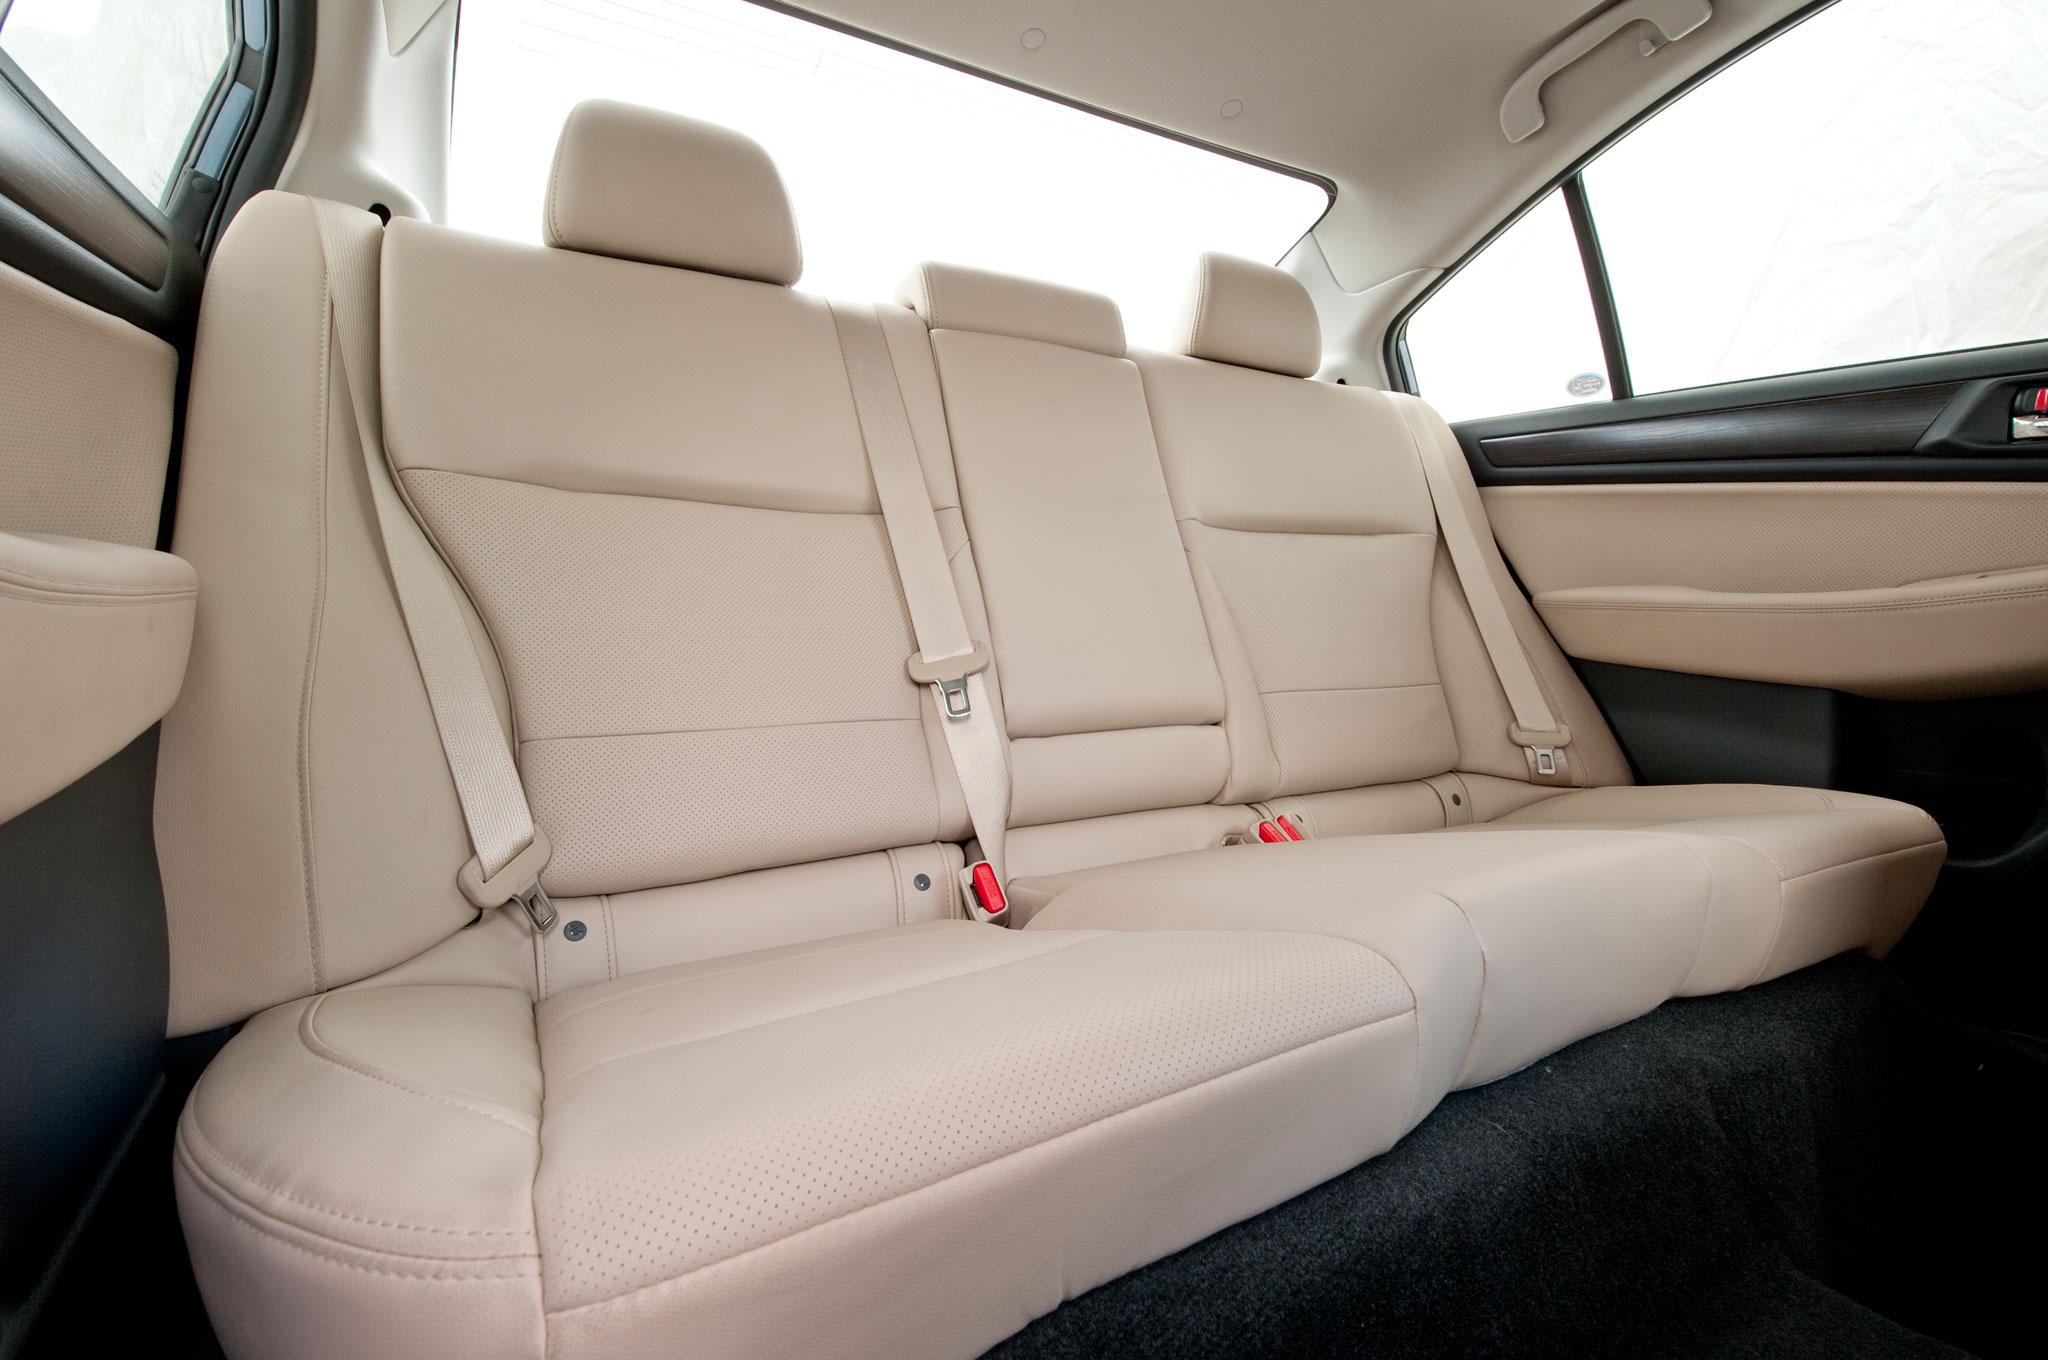 2015 Subaru Legacy 2.5i Limited PZEV Rear Seats Interior